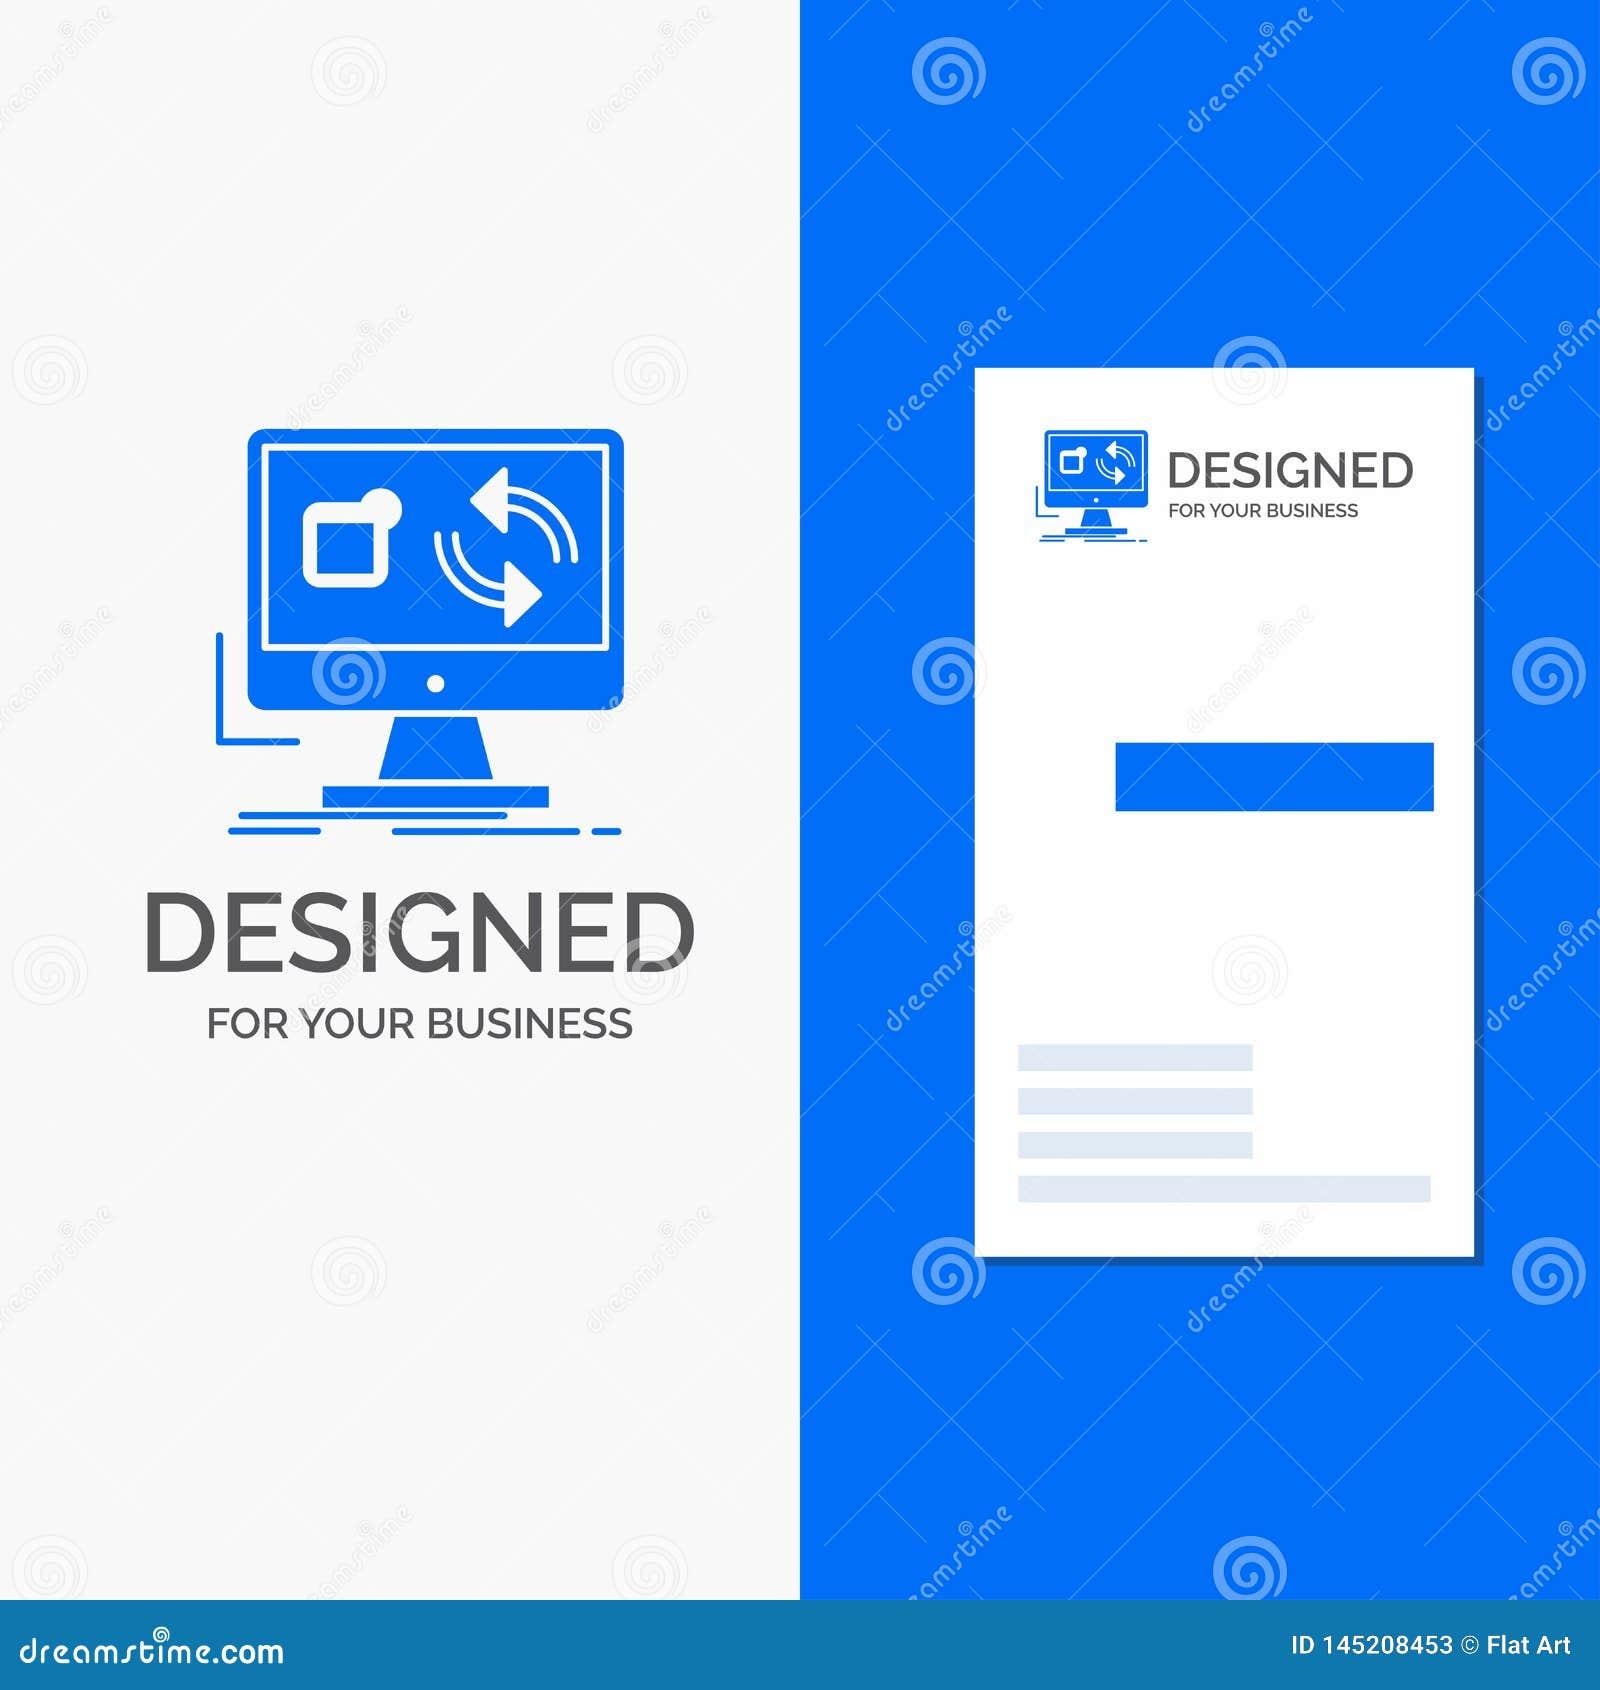 Gesch?fts-Logo f?r Aktualisierung, App, Anwendung, installieren, Synchronisierung Vertikale blaue Gesch?fts-/Visitenkarteschablon